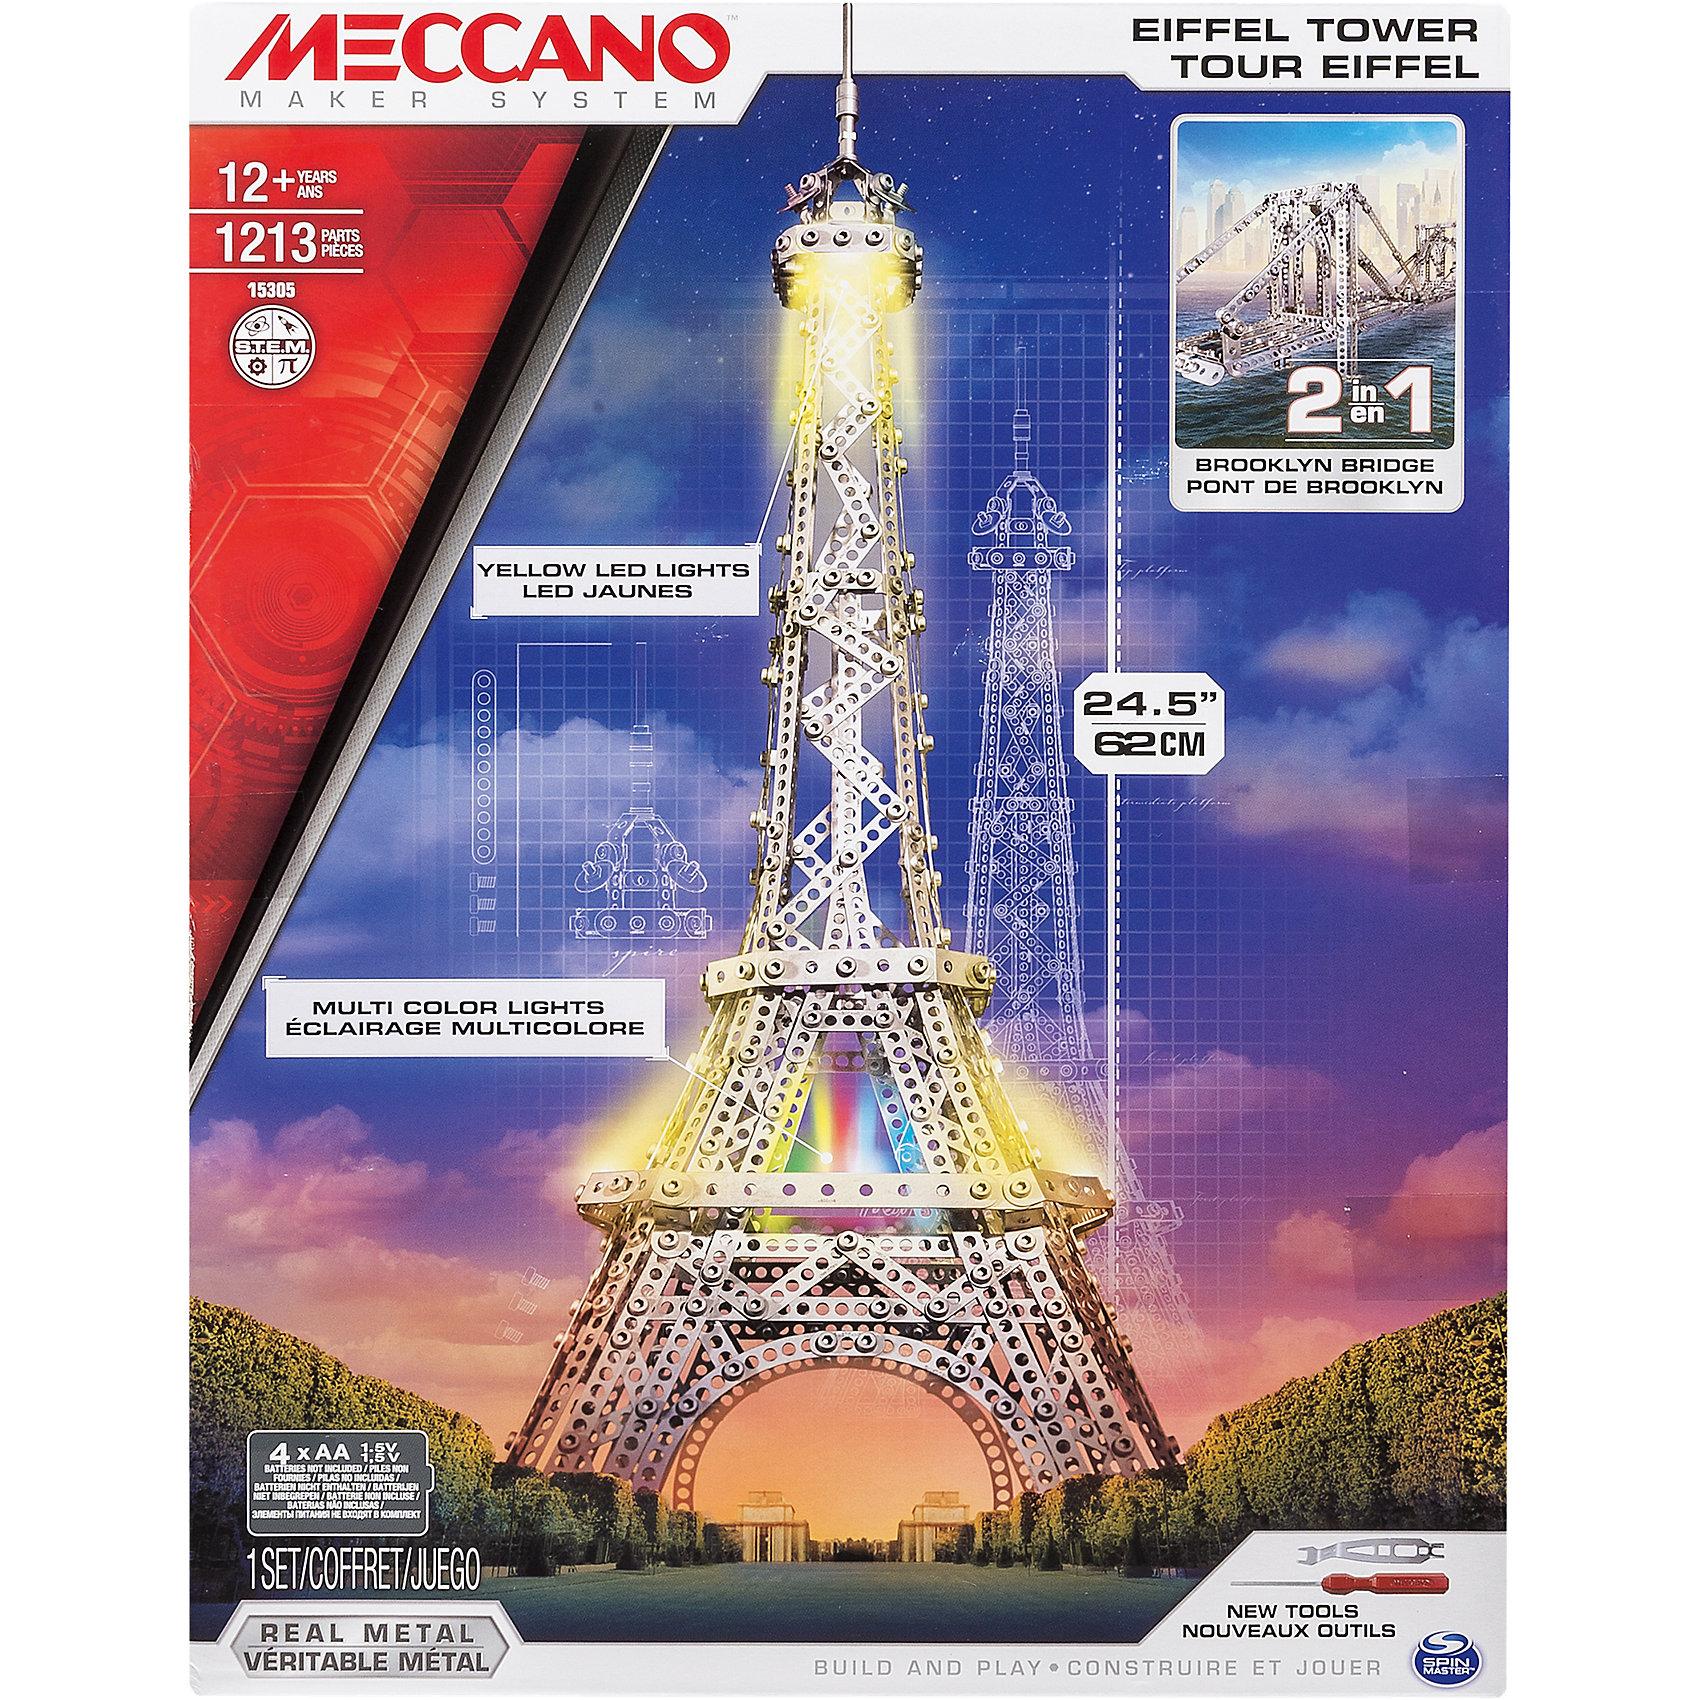 Meccano Эйфелева башня (2 модели), Meccano meccano эйфелева башня 2 модели meccano